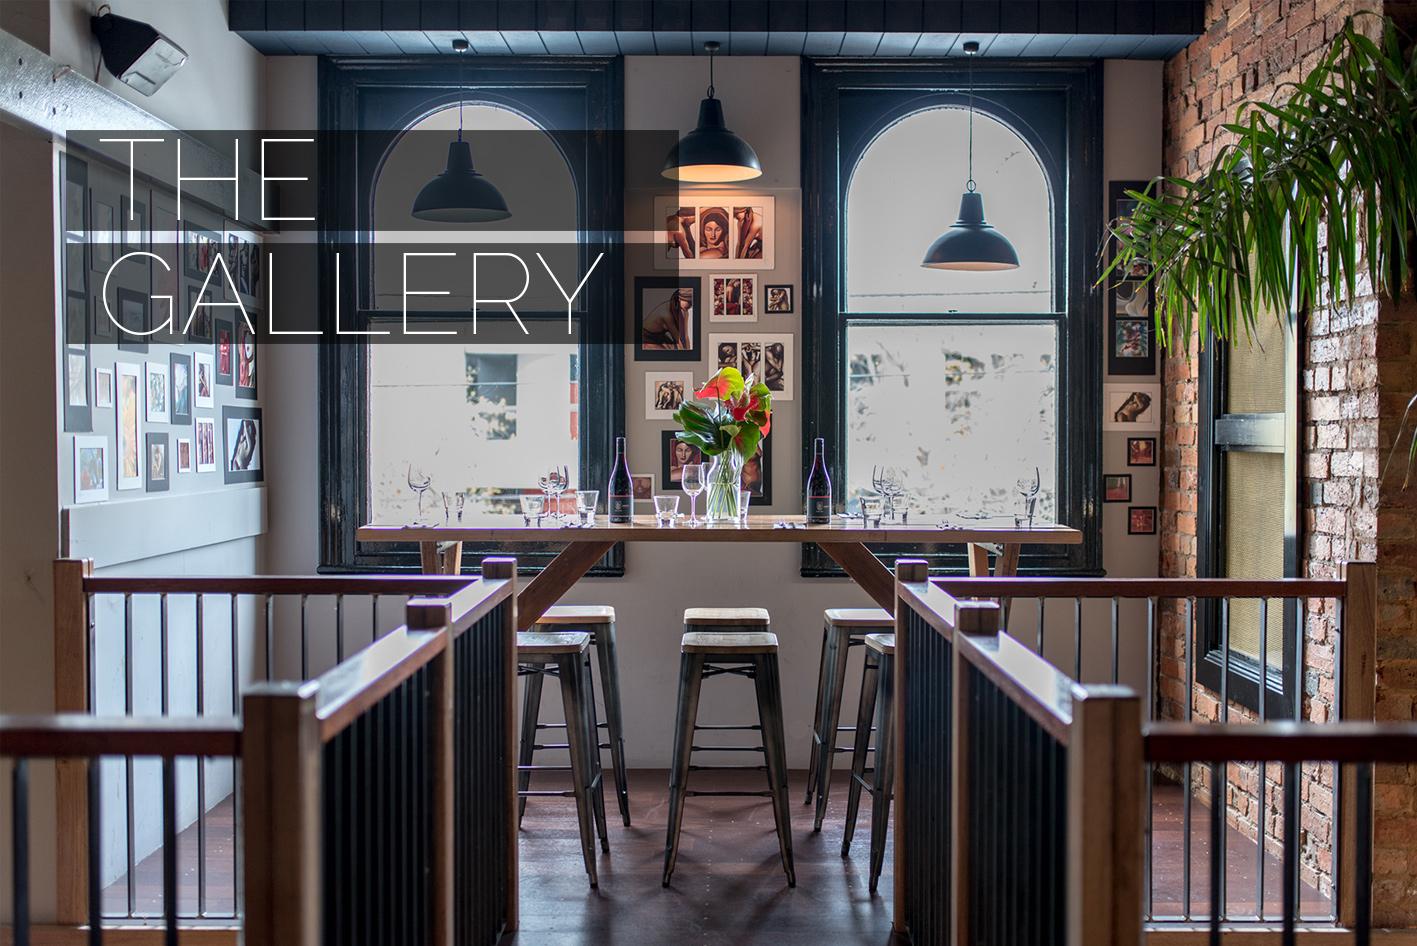 10.-The-Gallery.jpg